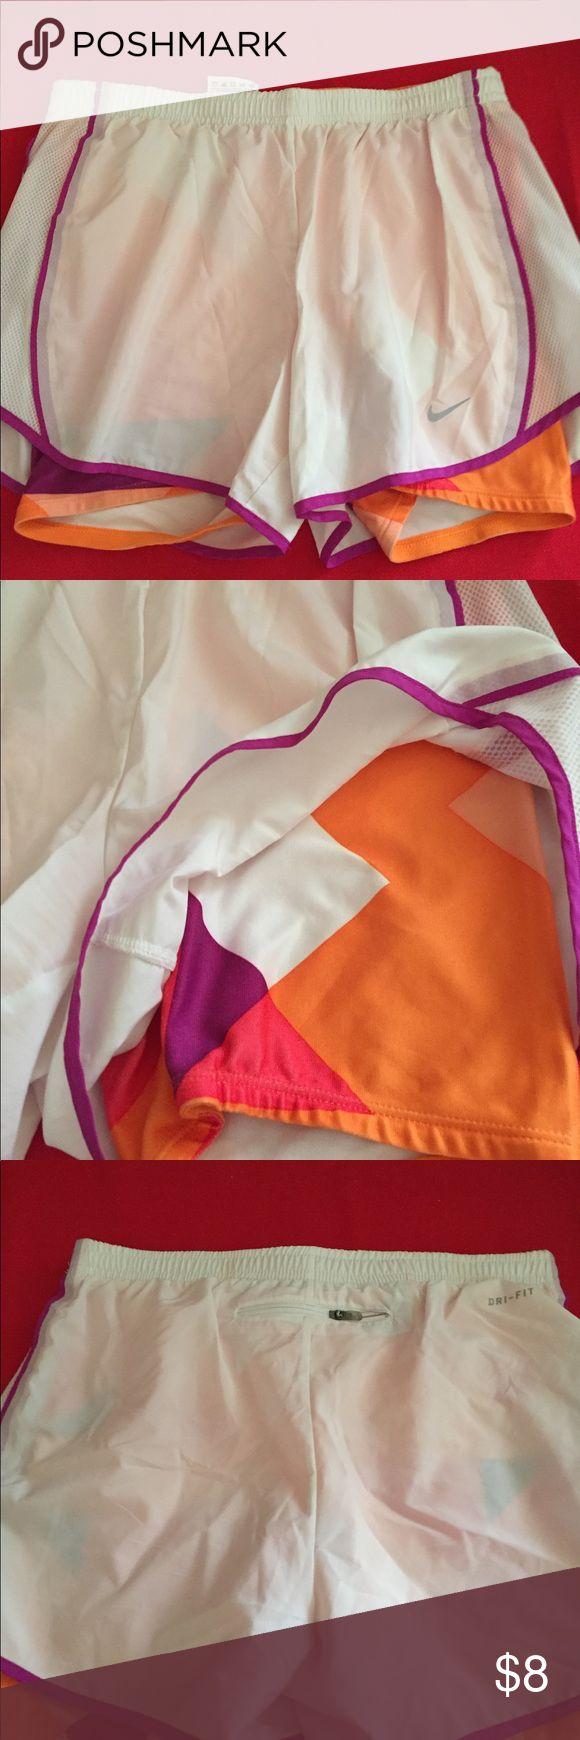 Nike dri fit shorts Zipper pocket in back and small pocket inside Nike Shorts